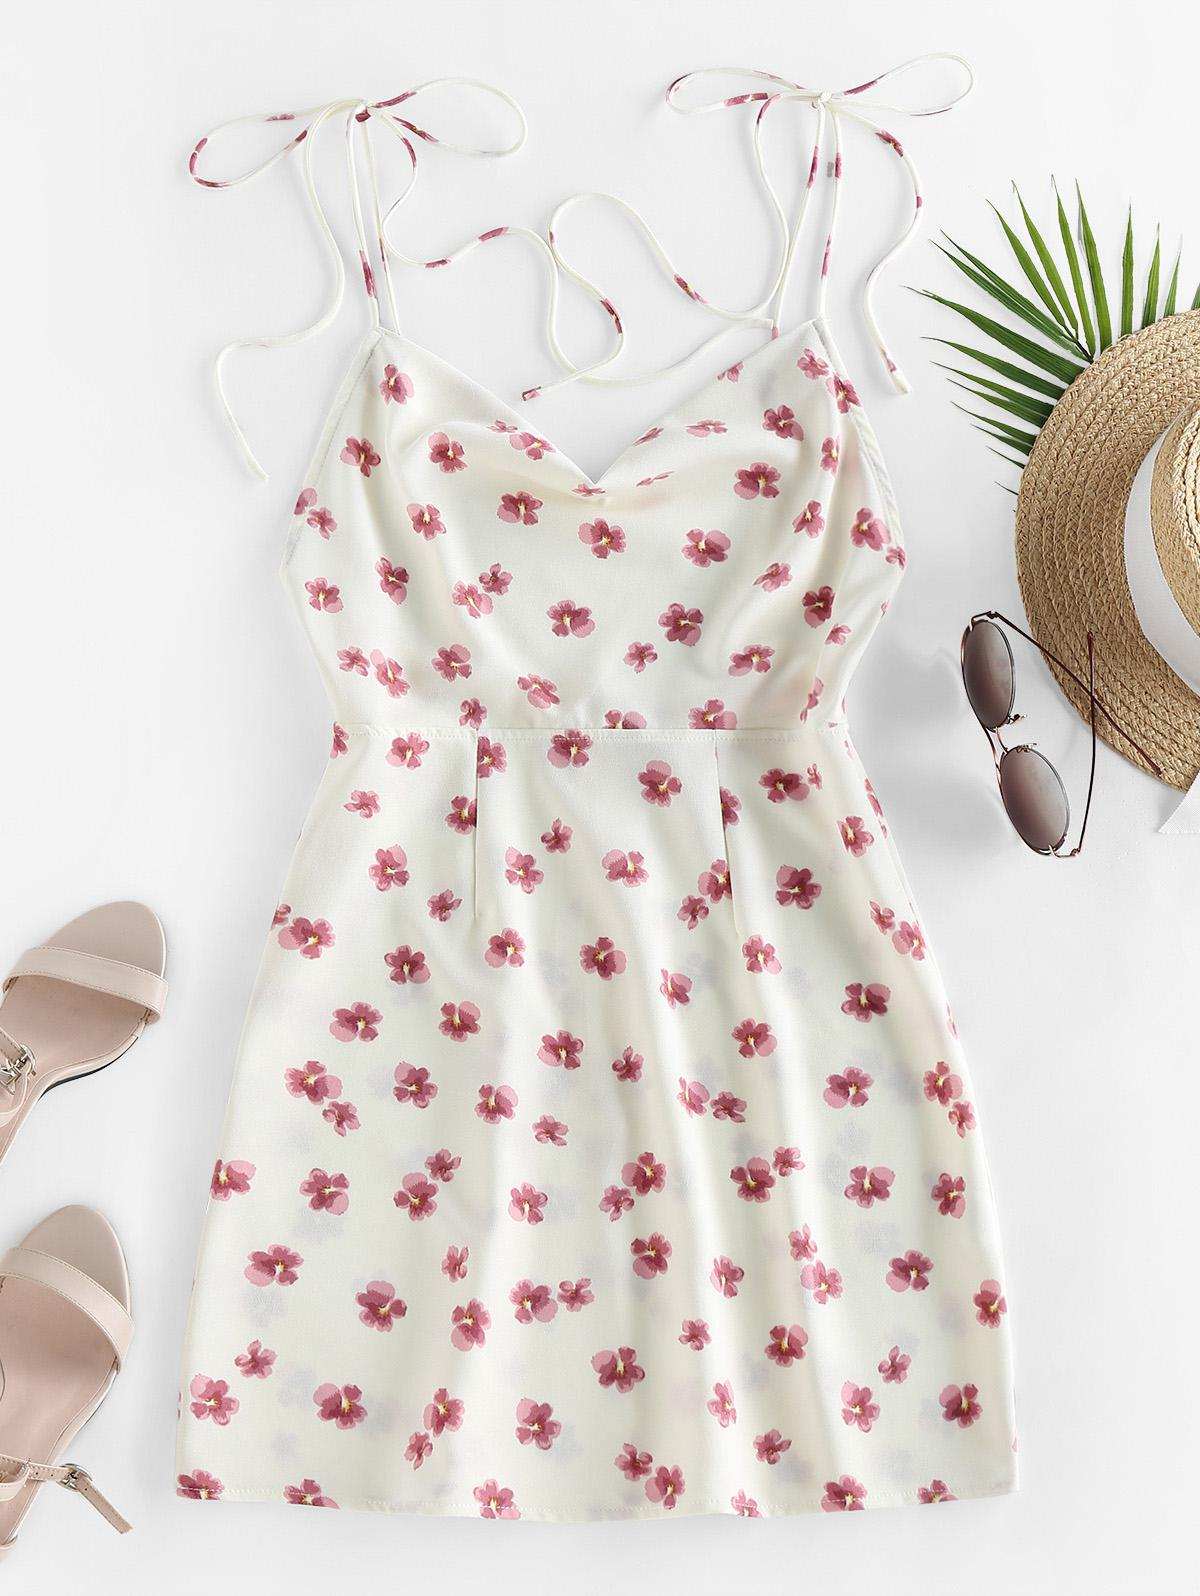 ZAFUL Ditsy Print Tie Shoulder Backless Dress